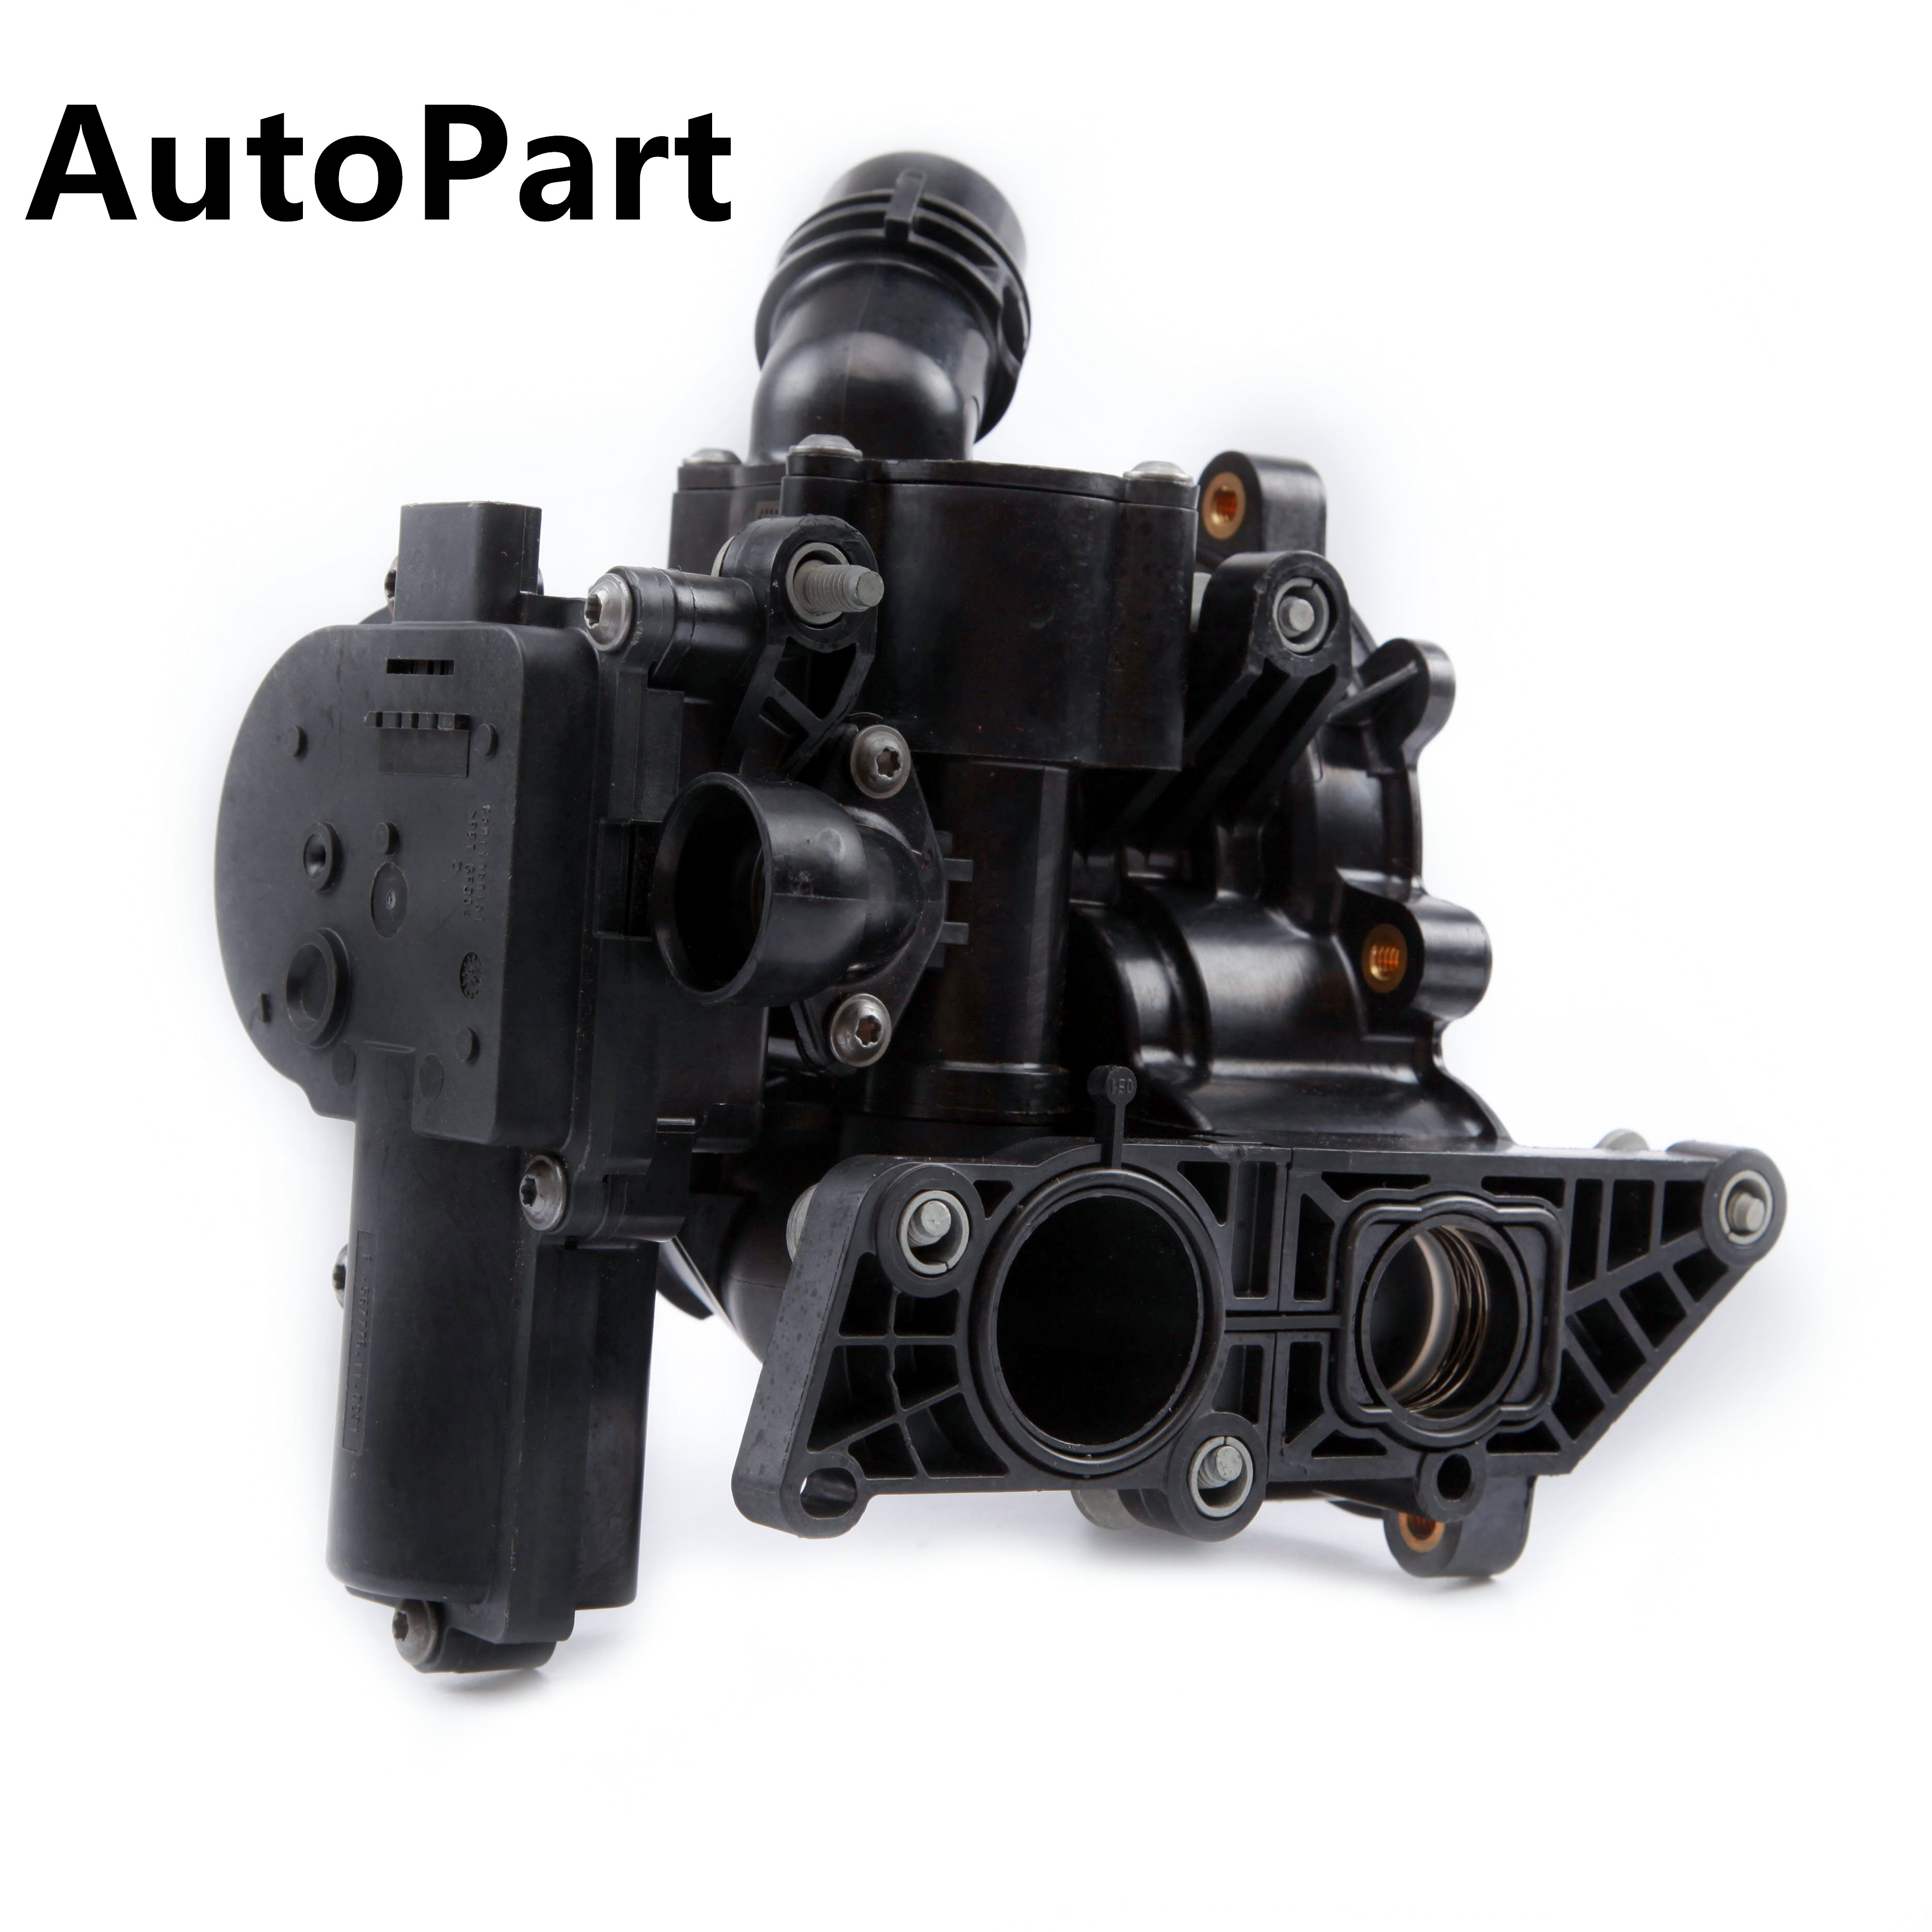 06L 121 111 B 06L121111G พลาสติก EA888 อิเล็กทรอนิกส์ปั๊มน้ำ Thermostat สำหรับ VW Golf Audi A4 A6 A7 Q5 q7 1.8TFSI 2.0TFSI